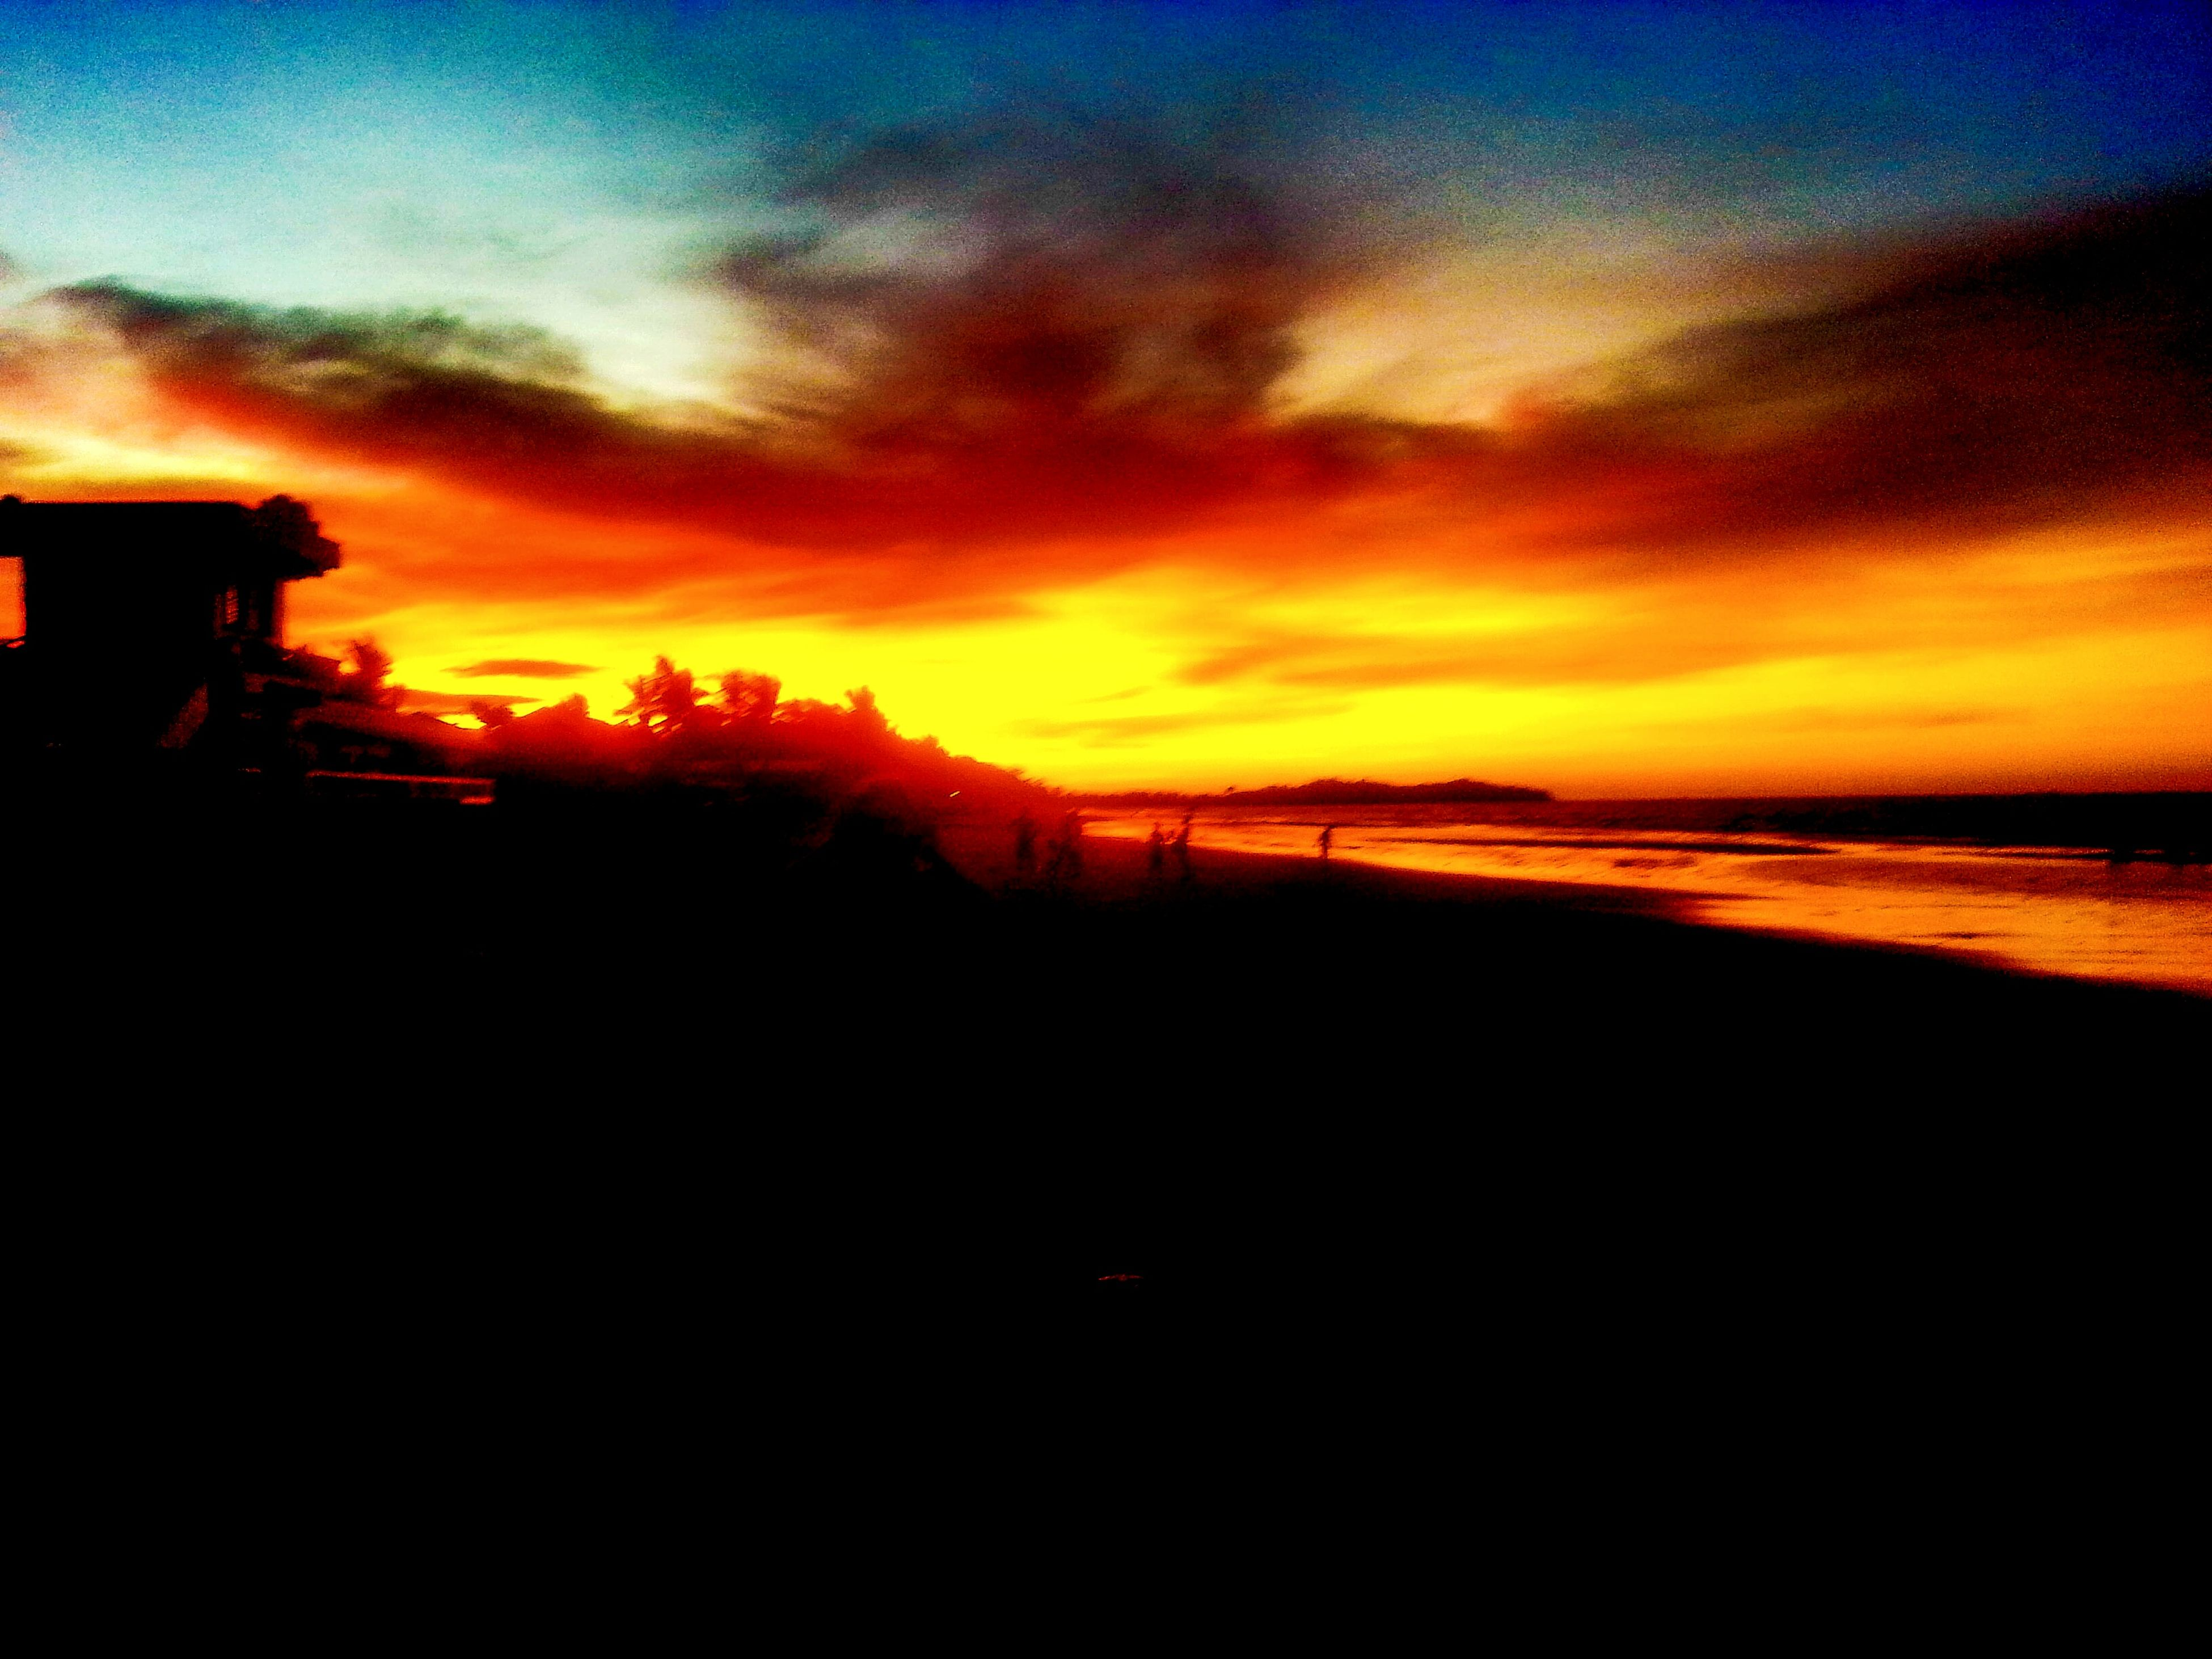 sunset, silhouette, orange color, scenics, sky, beauty in nature, tranquil scene, tranquility, idyllic, dramatic sky, nature, cloud - sky, dark, landscape, dusk, cloud, moody sky, outdoors, majestic, atmospheric mood